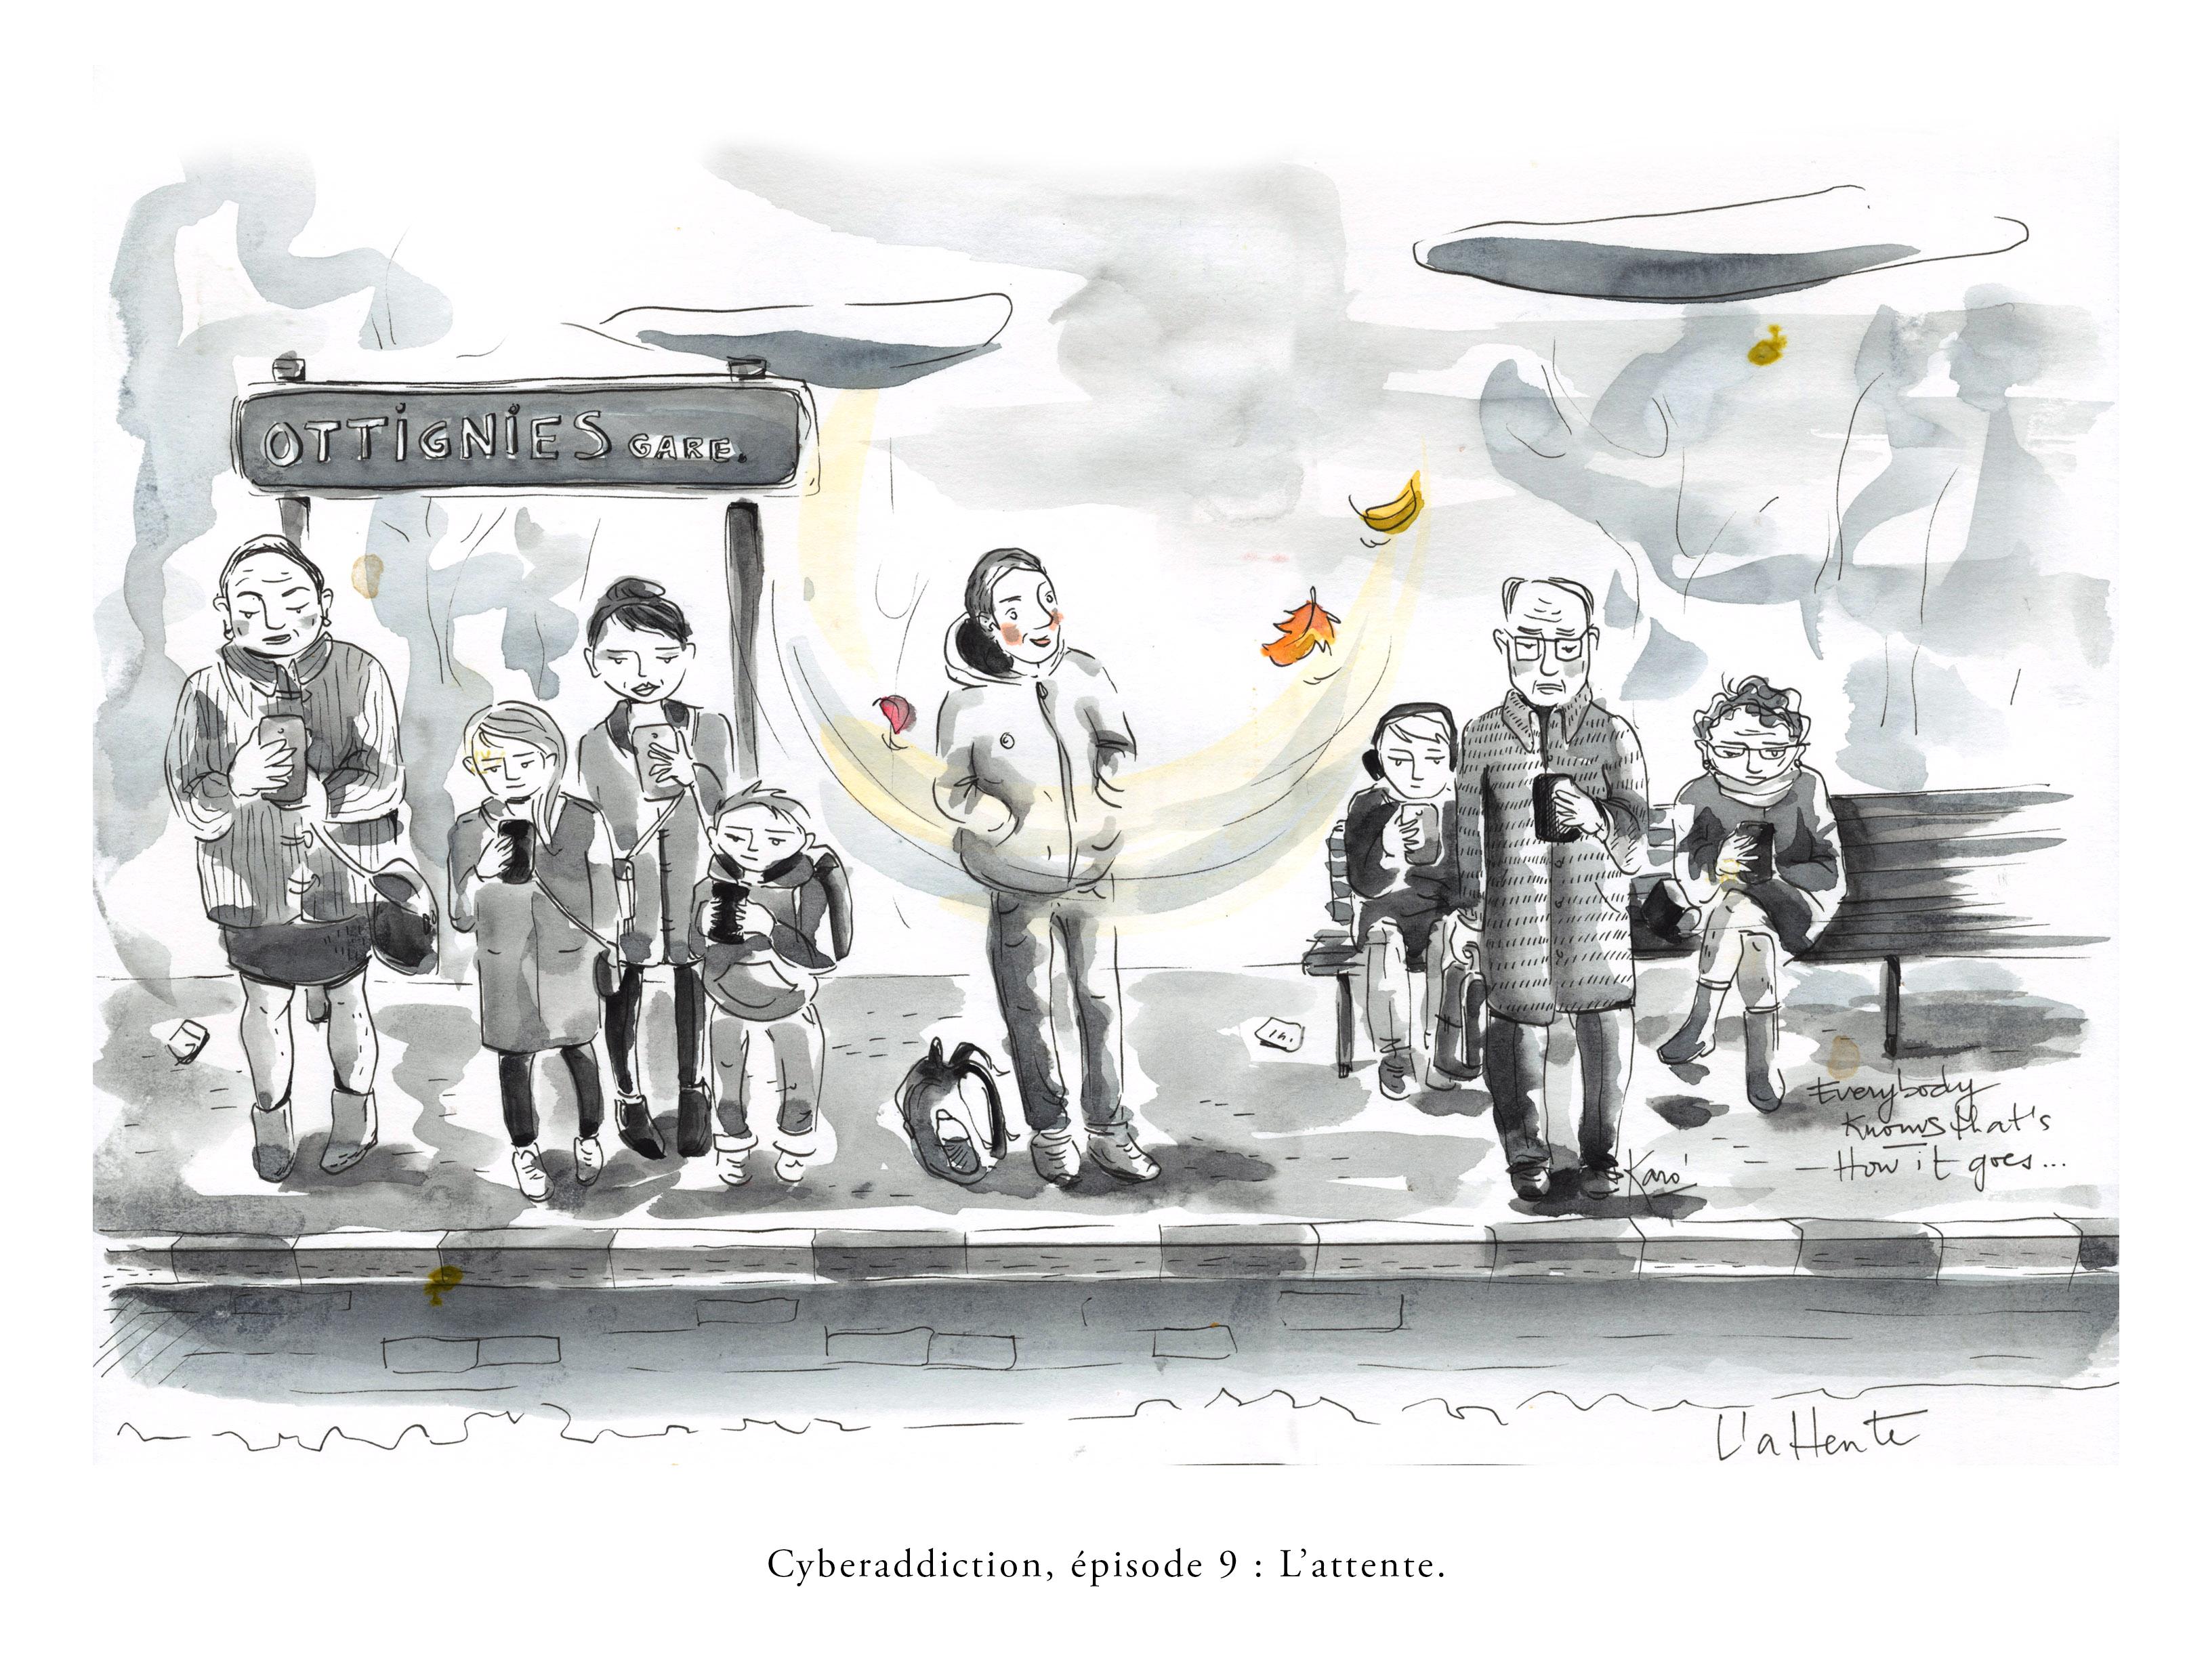 cyberaddiction_karopauwels_illustrations_111116